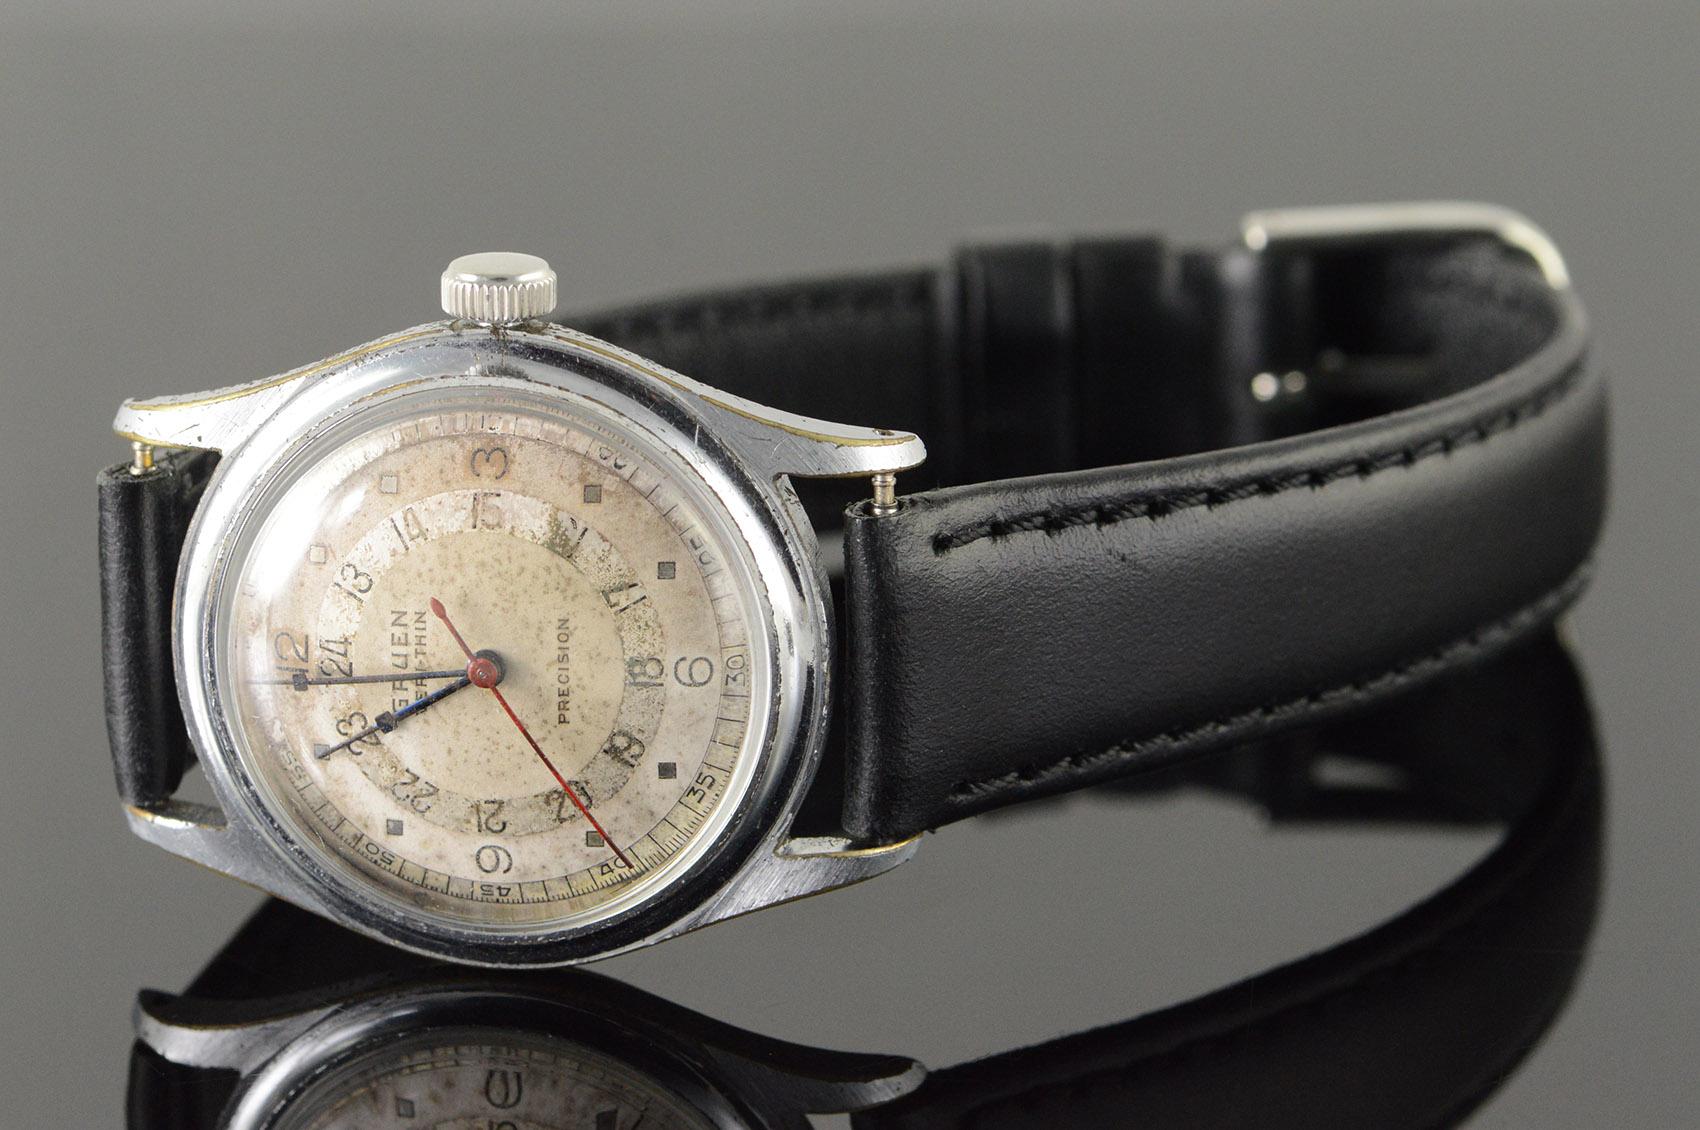 26mm Gruen Veri Thin Precision Wrist Watch Men S